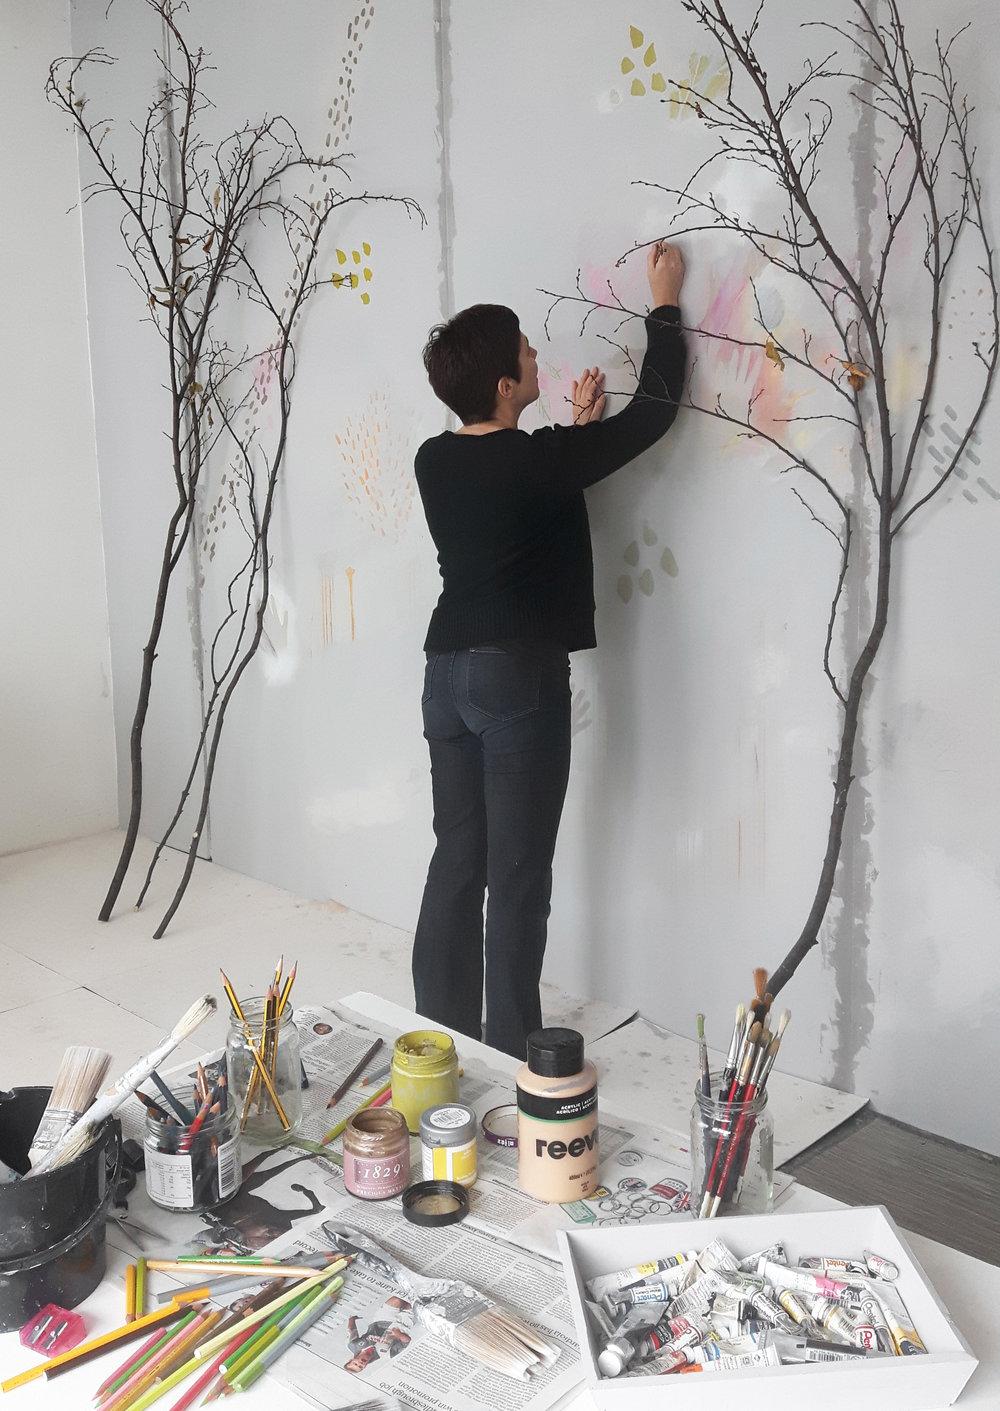 M drawing on wall.jpg